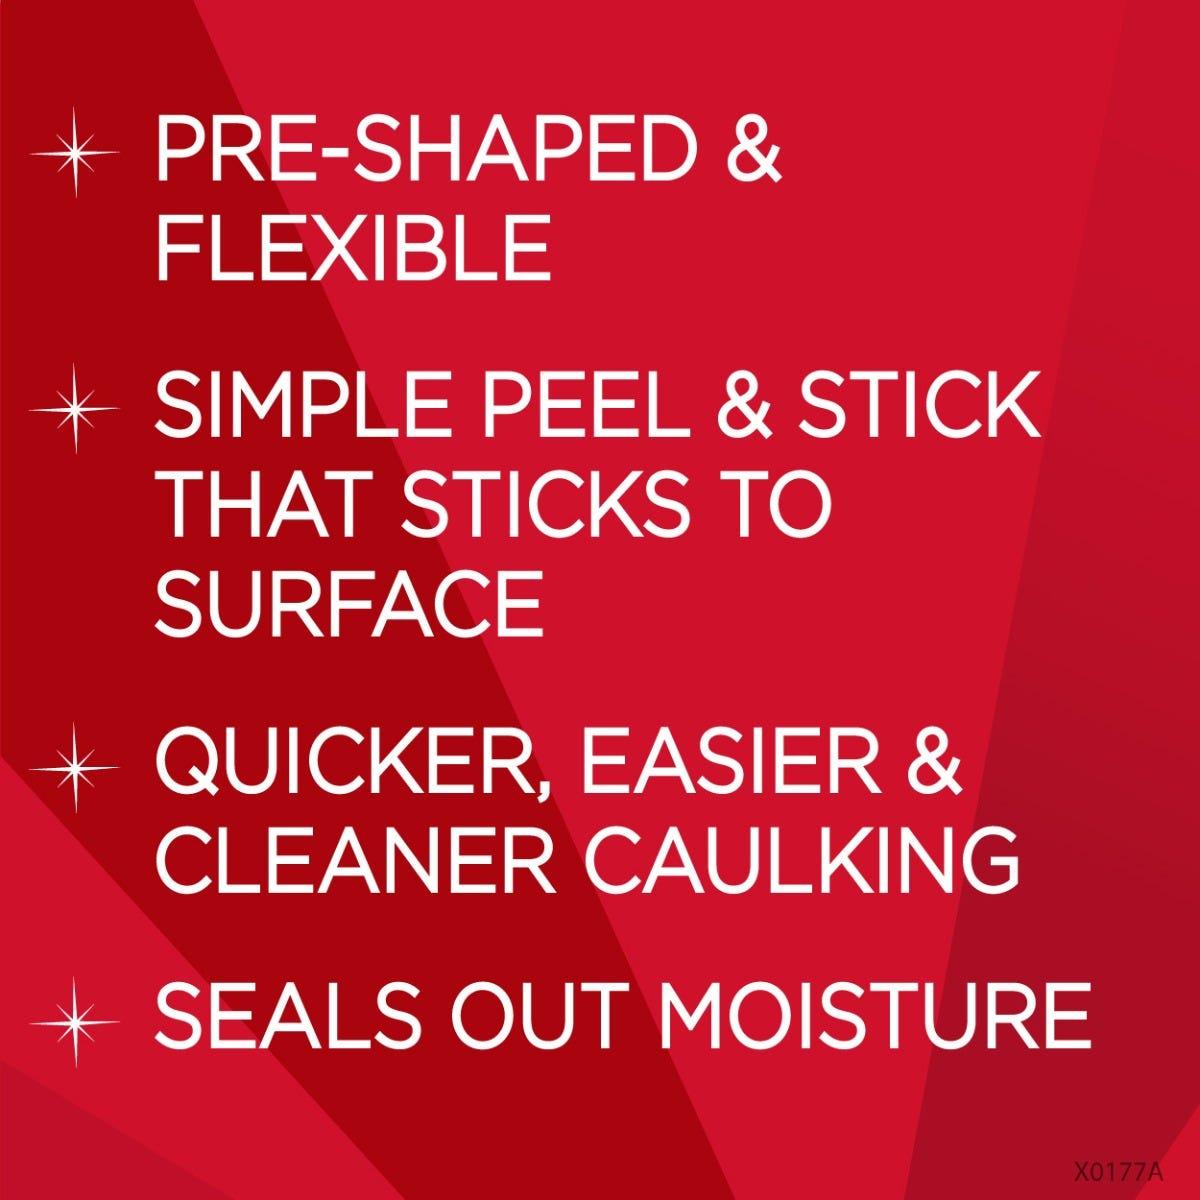 Peel and stick caulk benefits